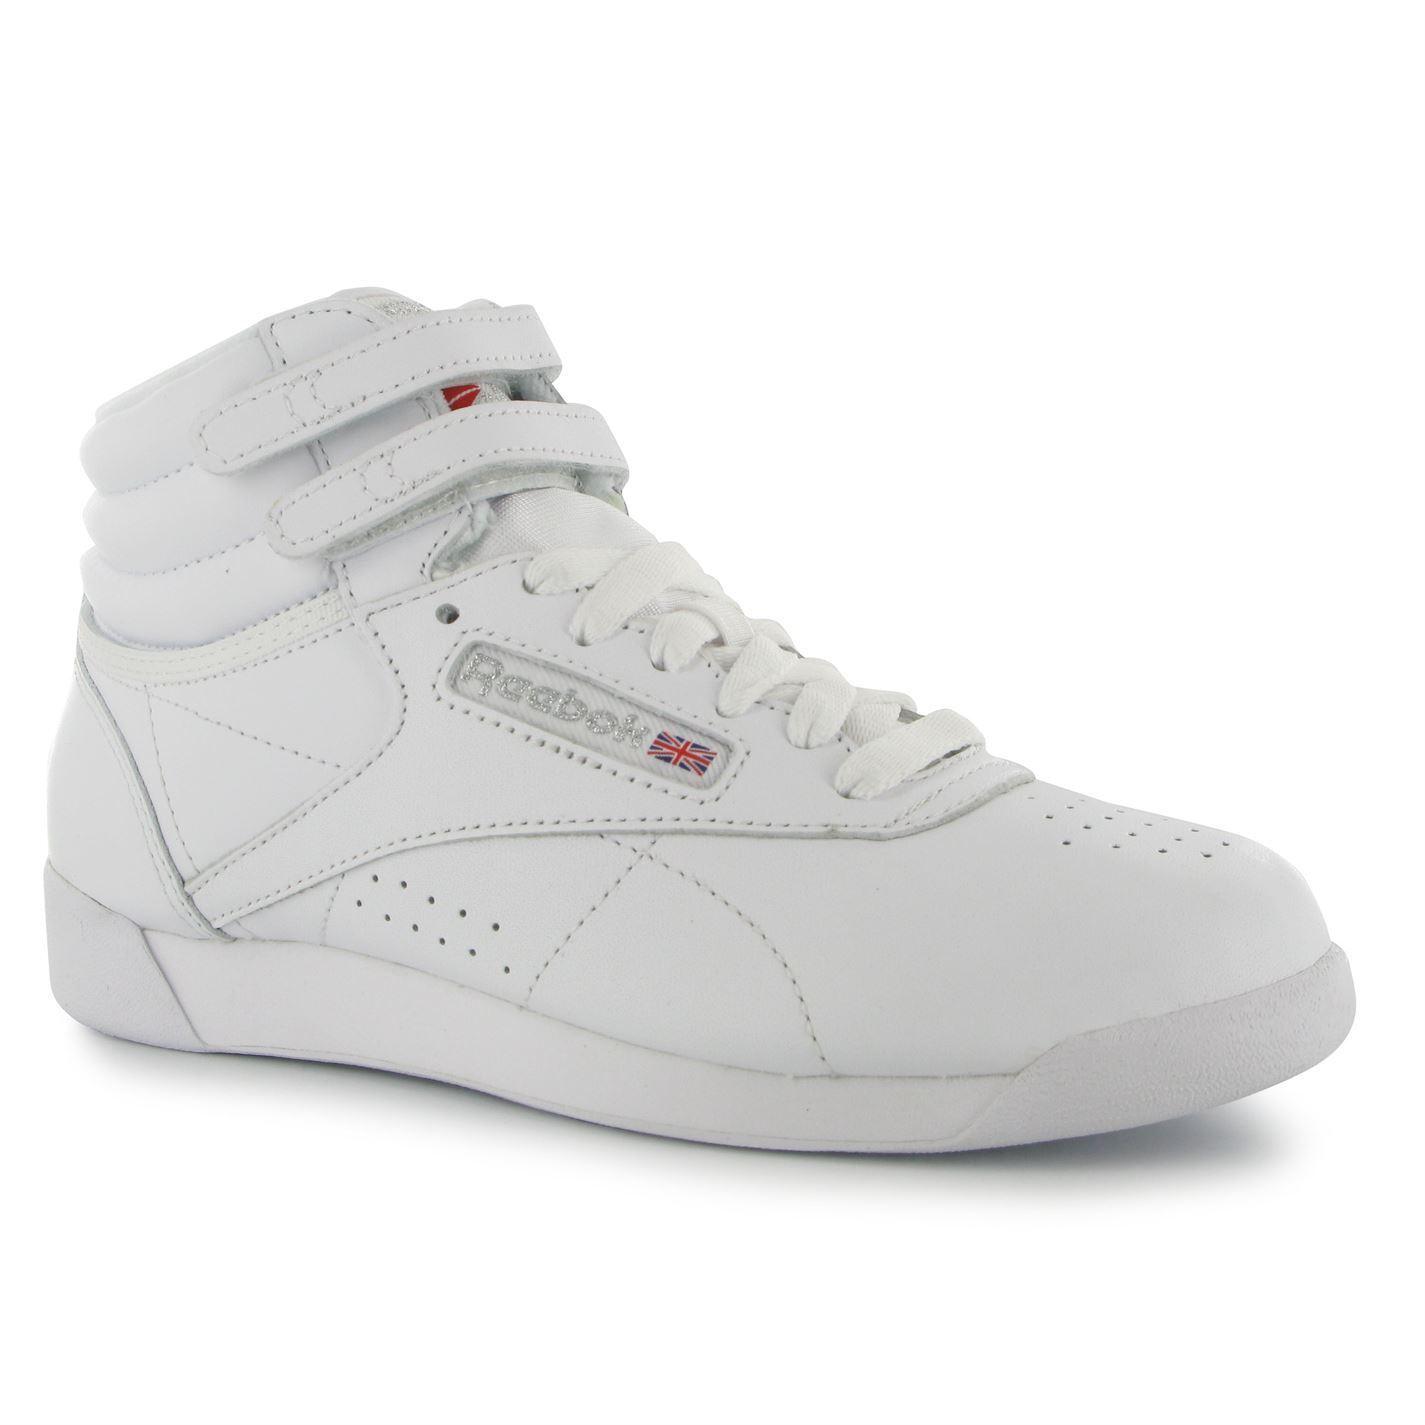 Reebok FreeStyle Donna Sneaker Alte US 5.5 EUR 35.5 cm 22.5 RIF. 5586 -